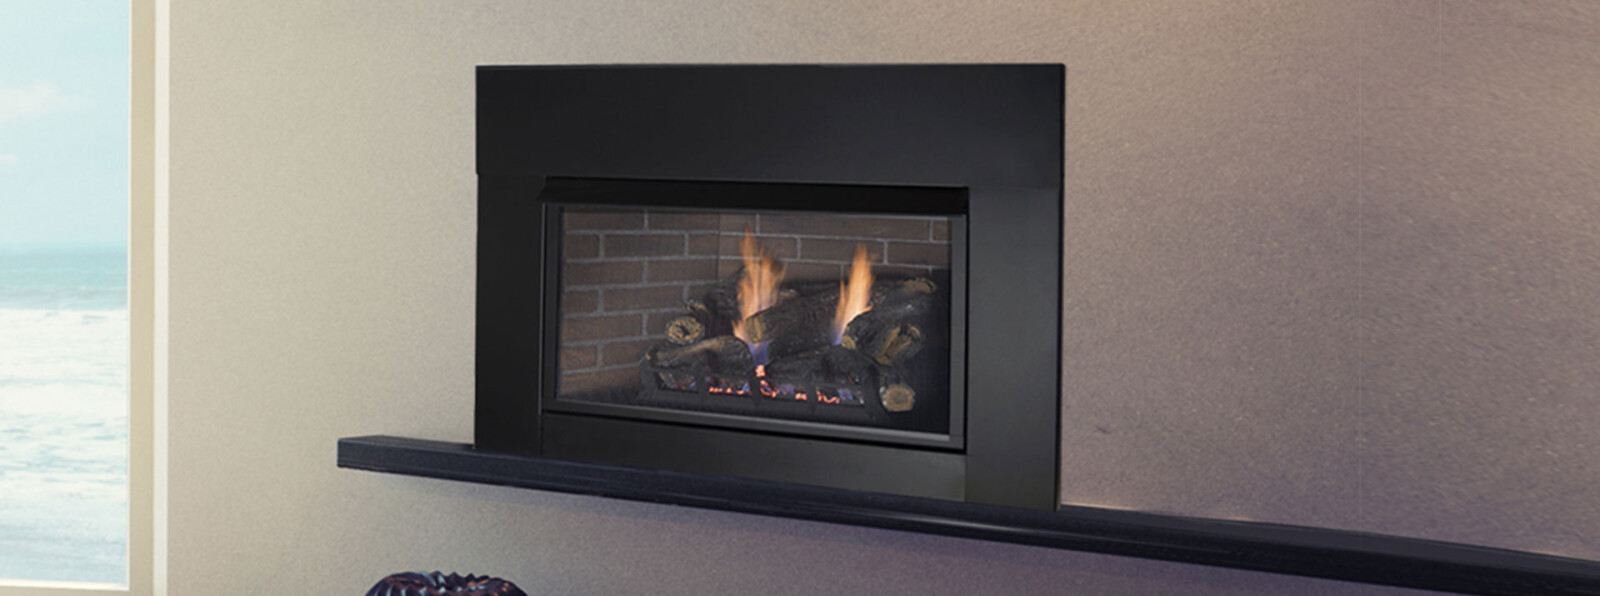 Monessen Solstice Vent Free Fireplace Insert